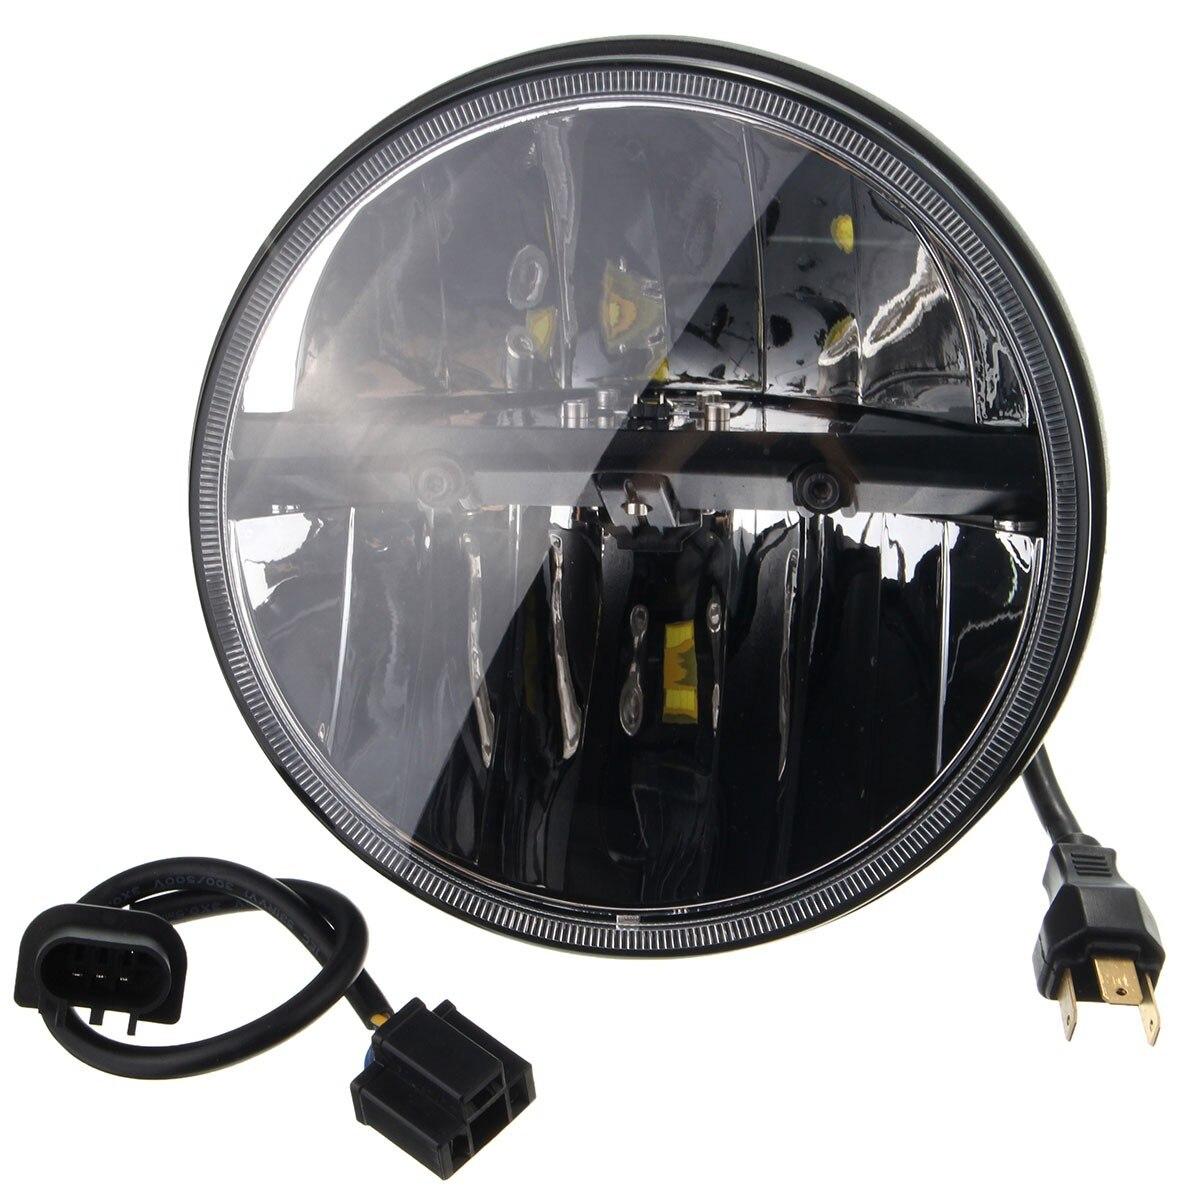 ФОТО 2PCS 7 Inch Chrome Motorbike Hi/Lo LED Round Headlight For Harley Projector for Jeep Light Lamp Bulb